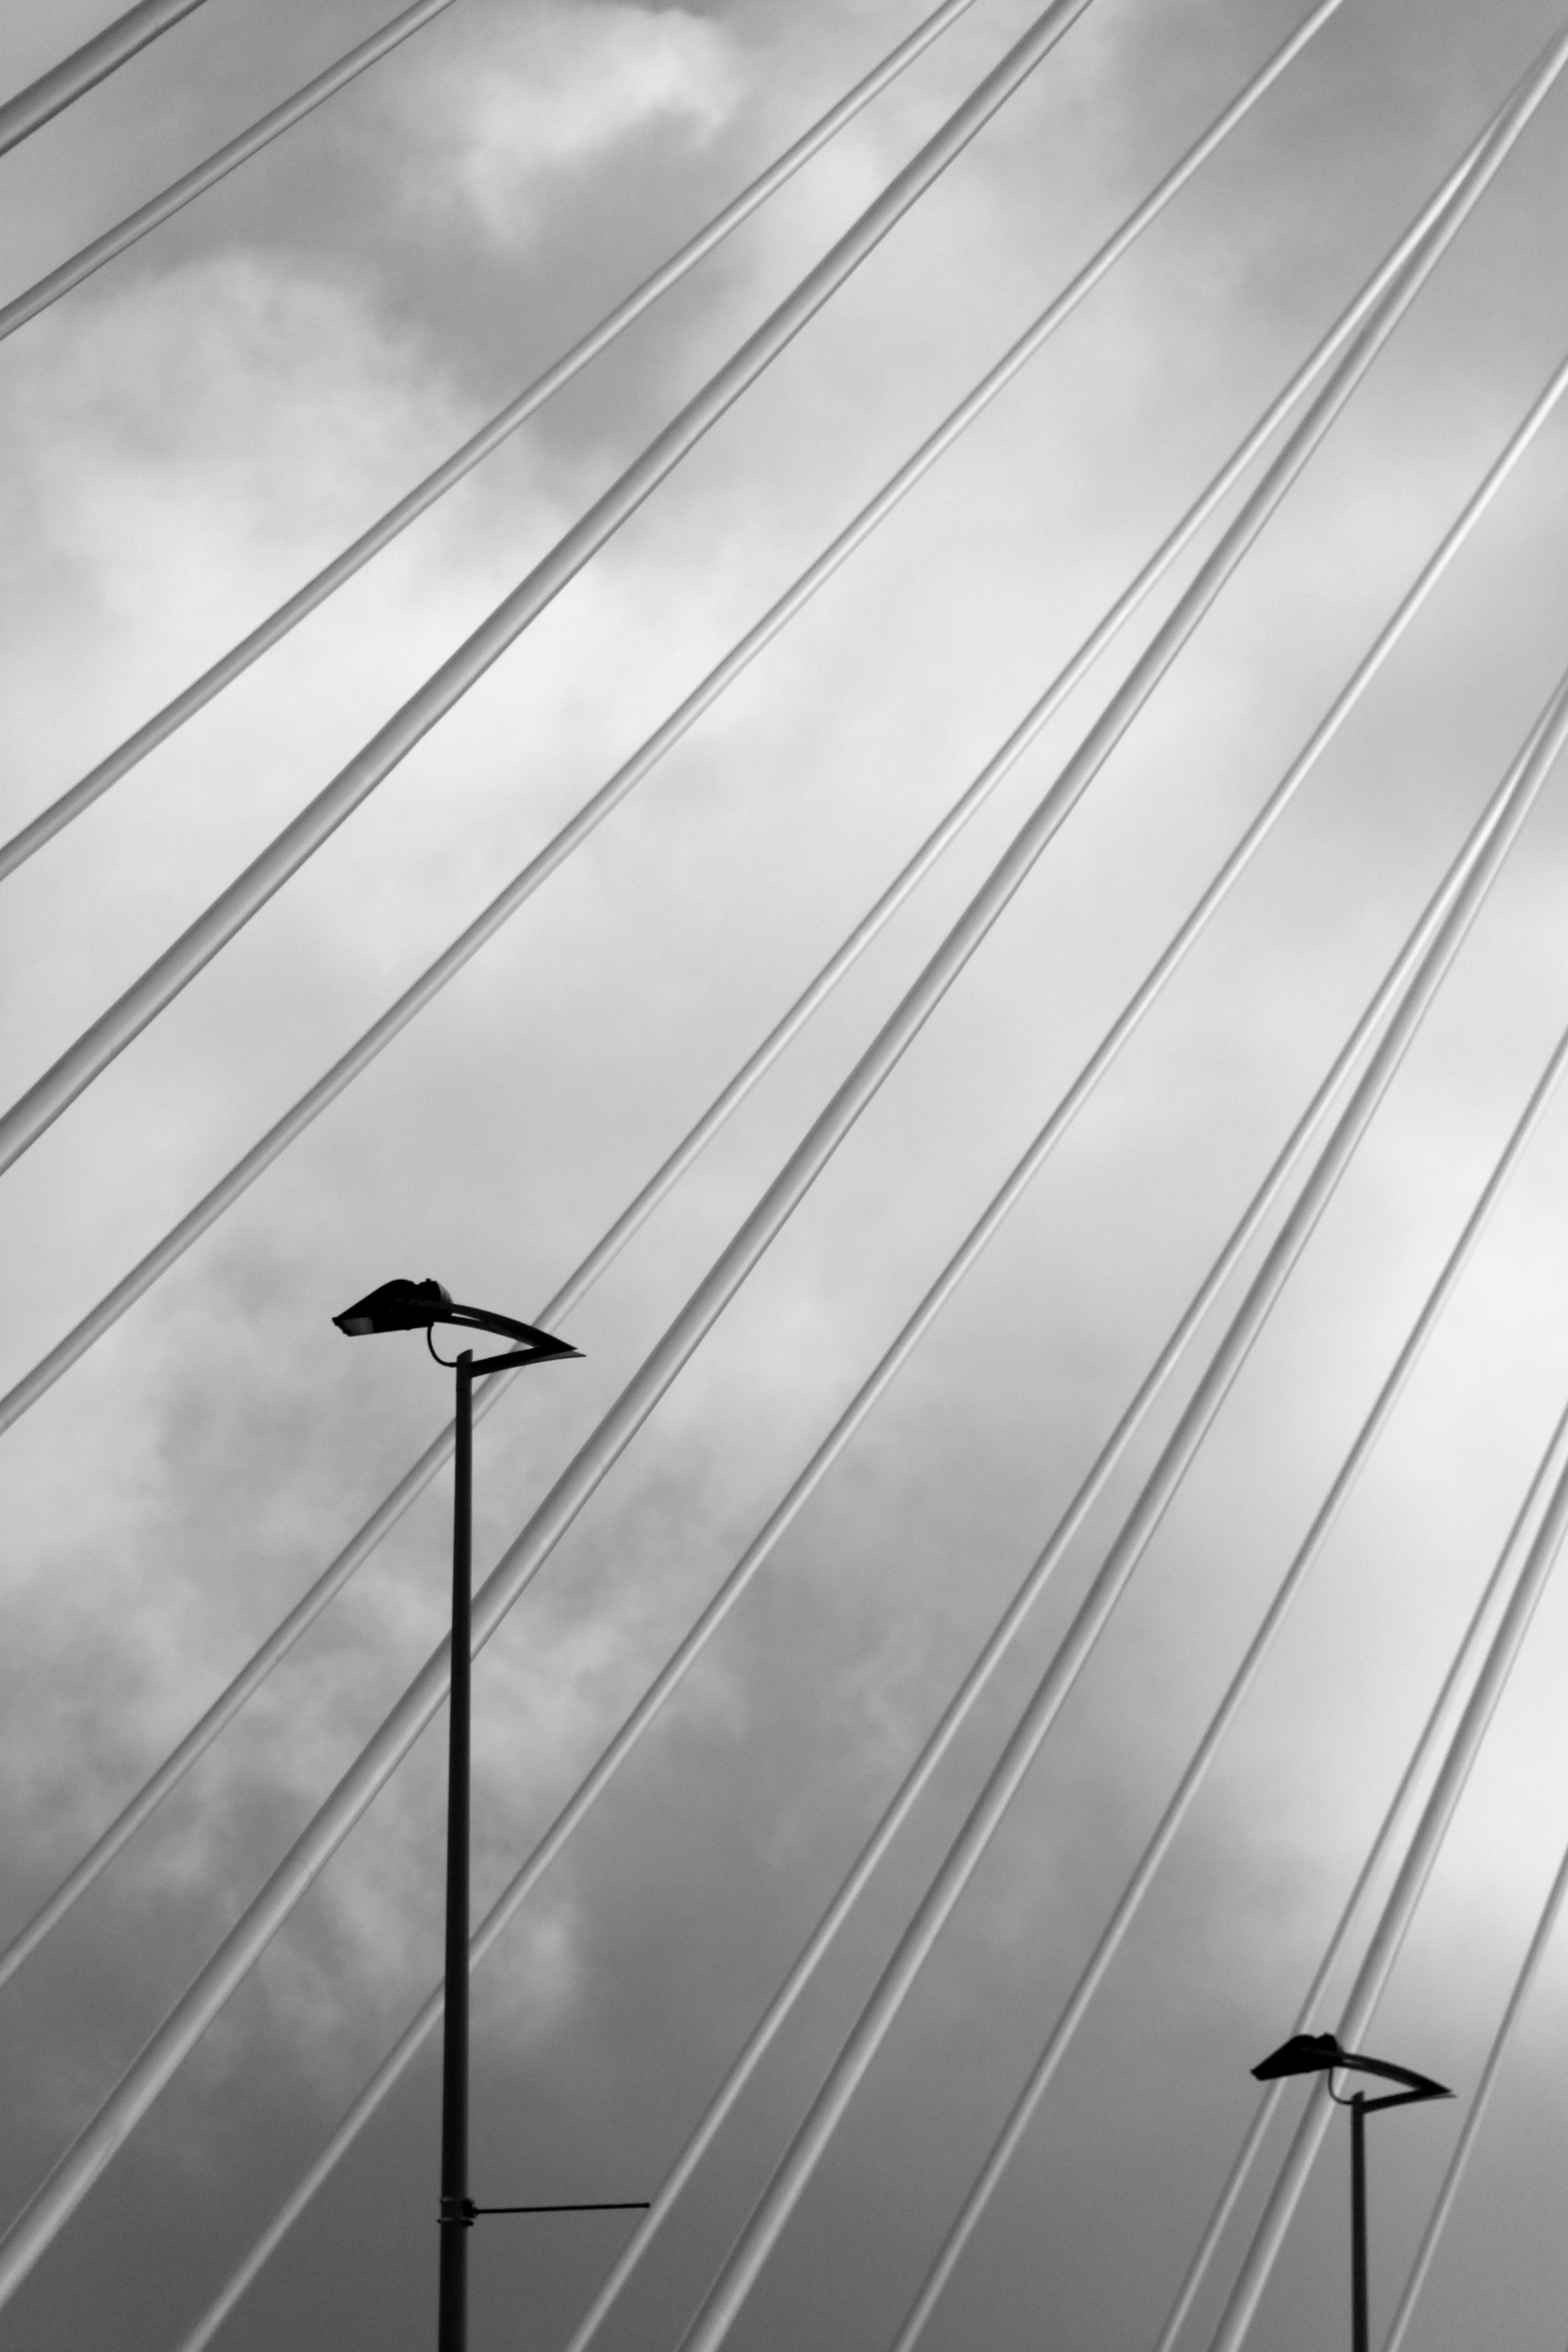 Wing Light Black And White Bridge Sunlight Wall Ceiling Line Reflection Street Monochrome